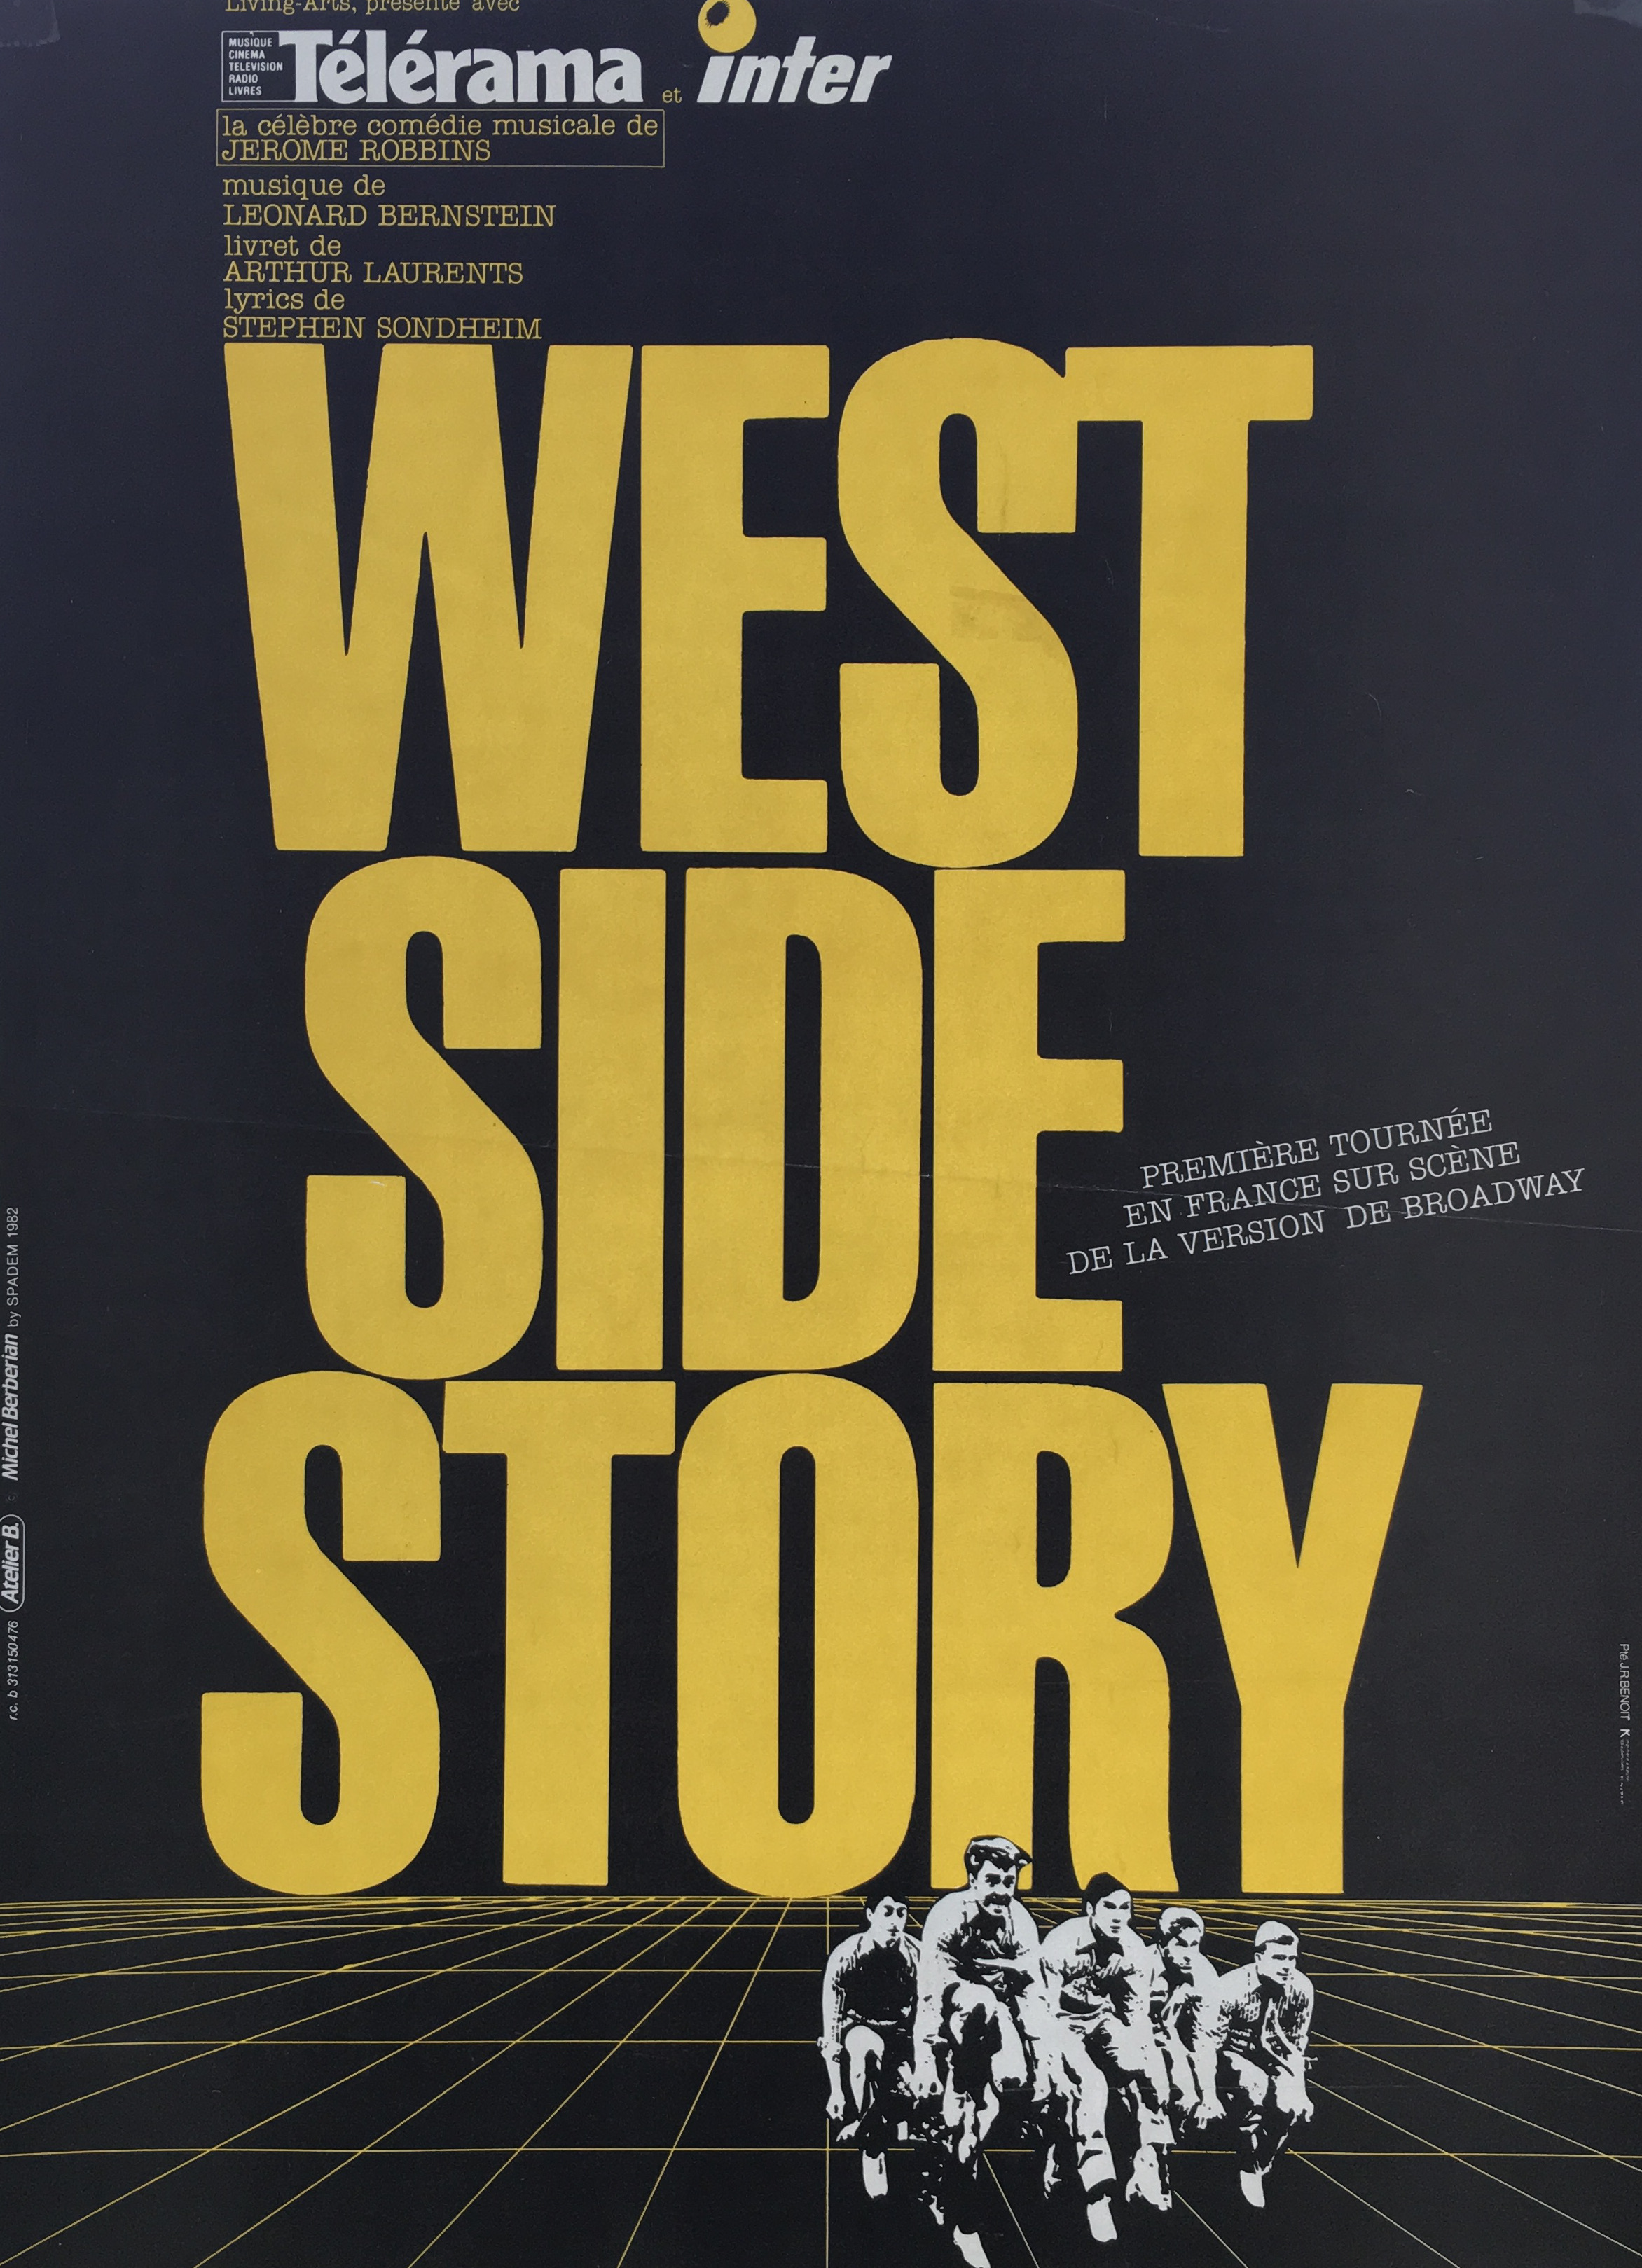 westsidestorytelerama.JPG